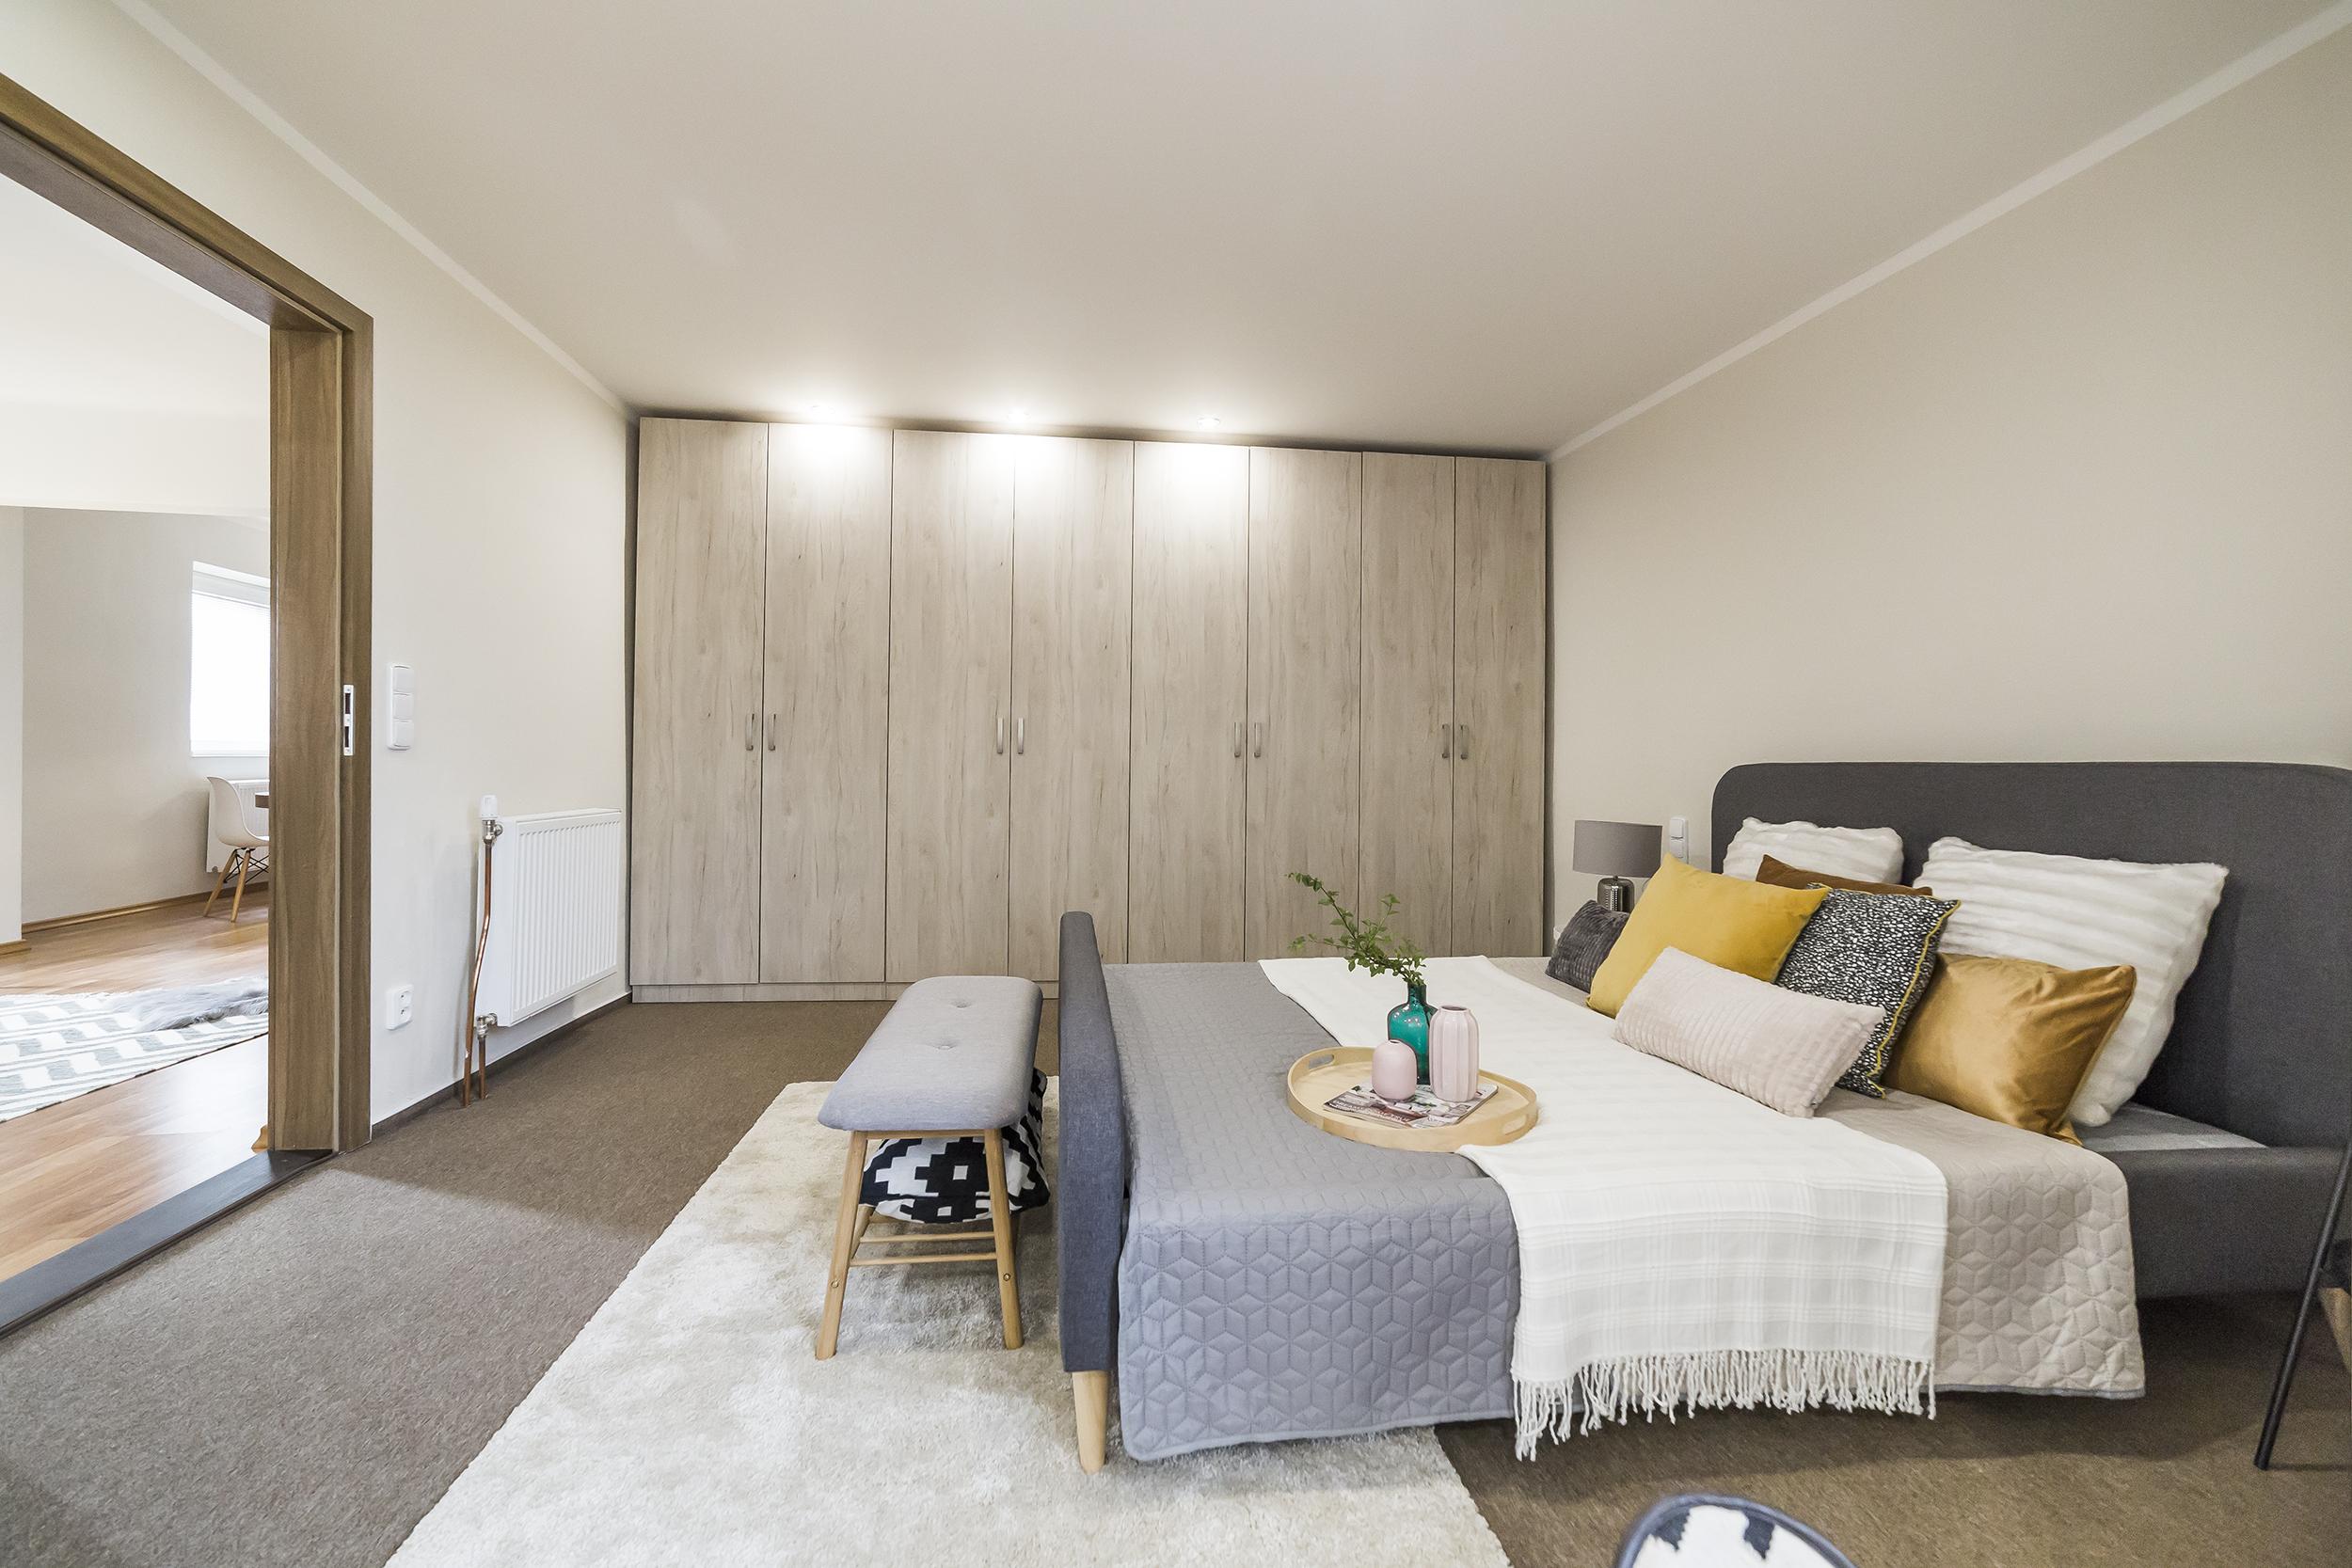 postel koberec polstar lampa stolek svetlo radiator prodej bytu linda bittova